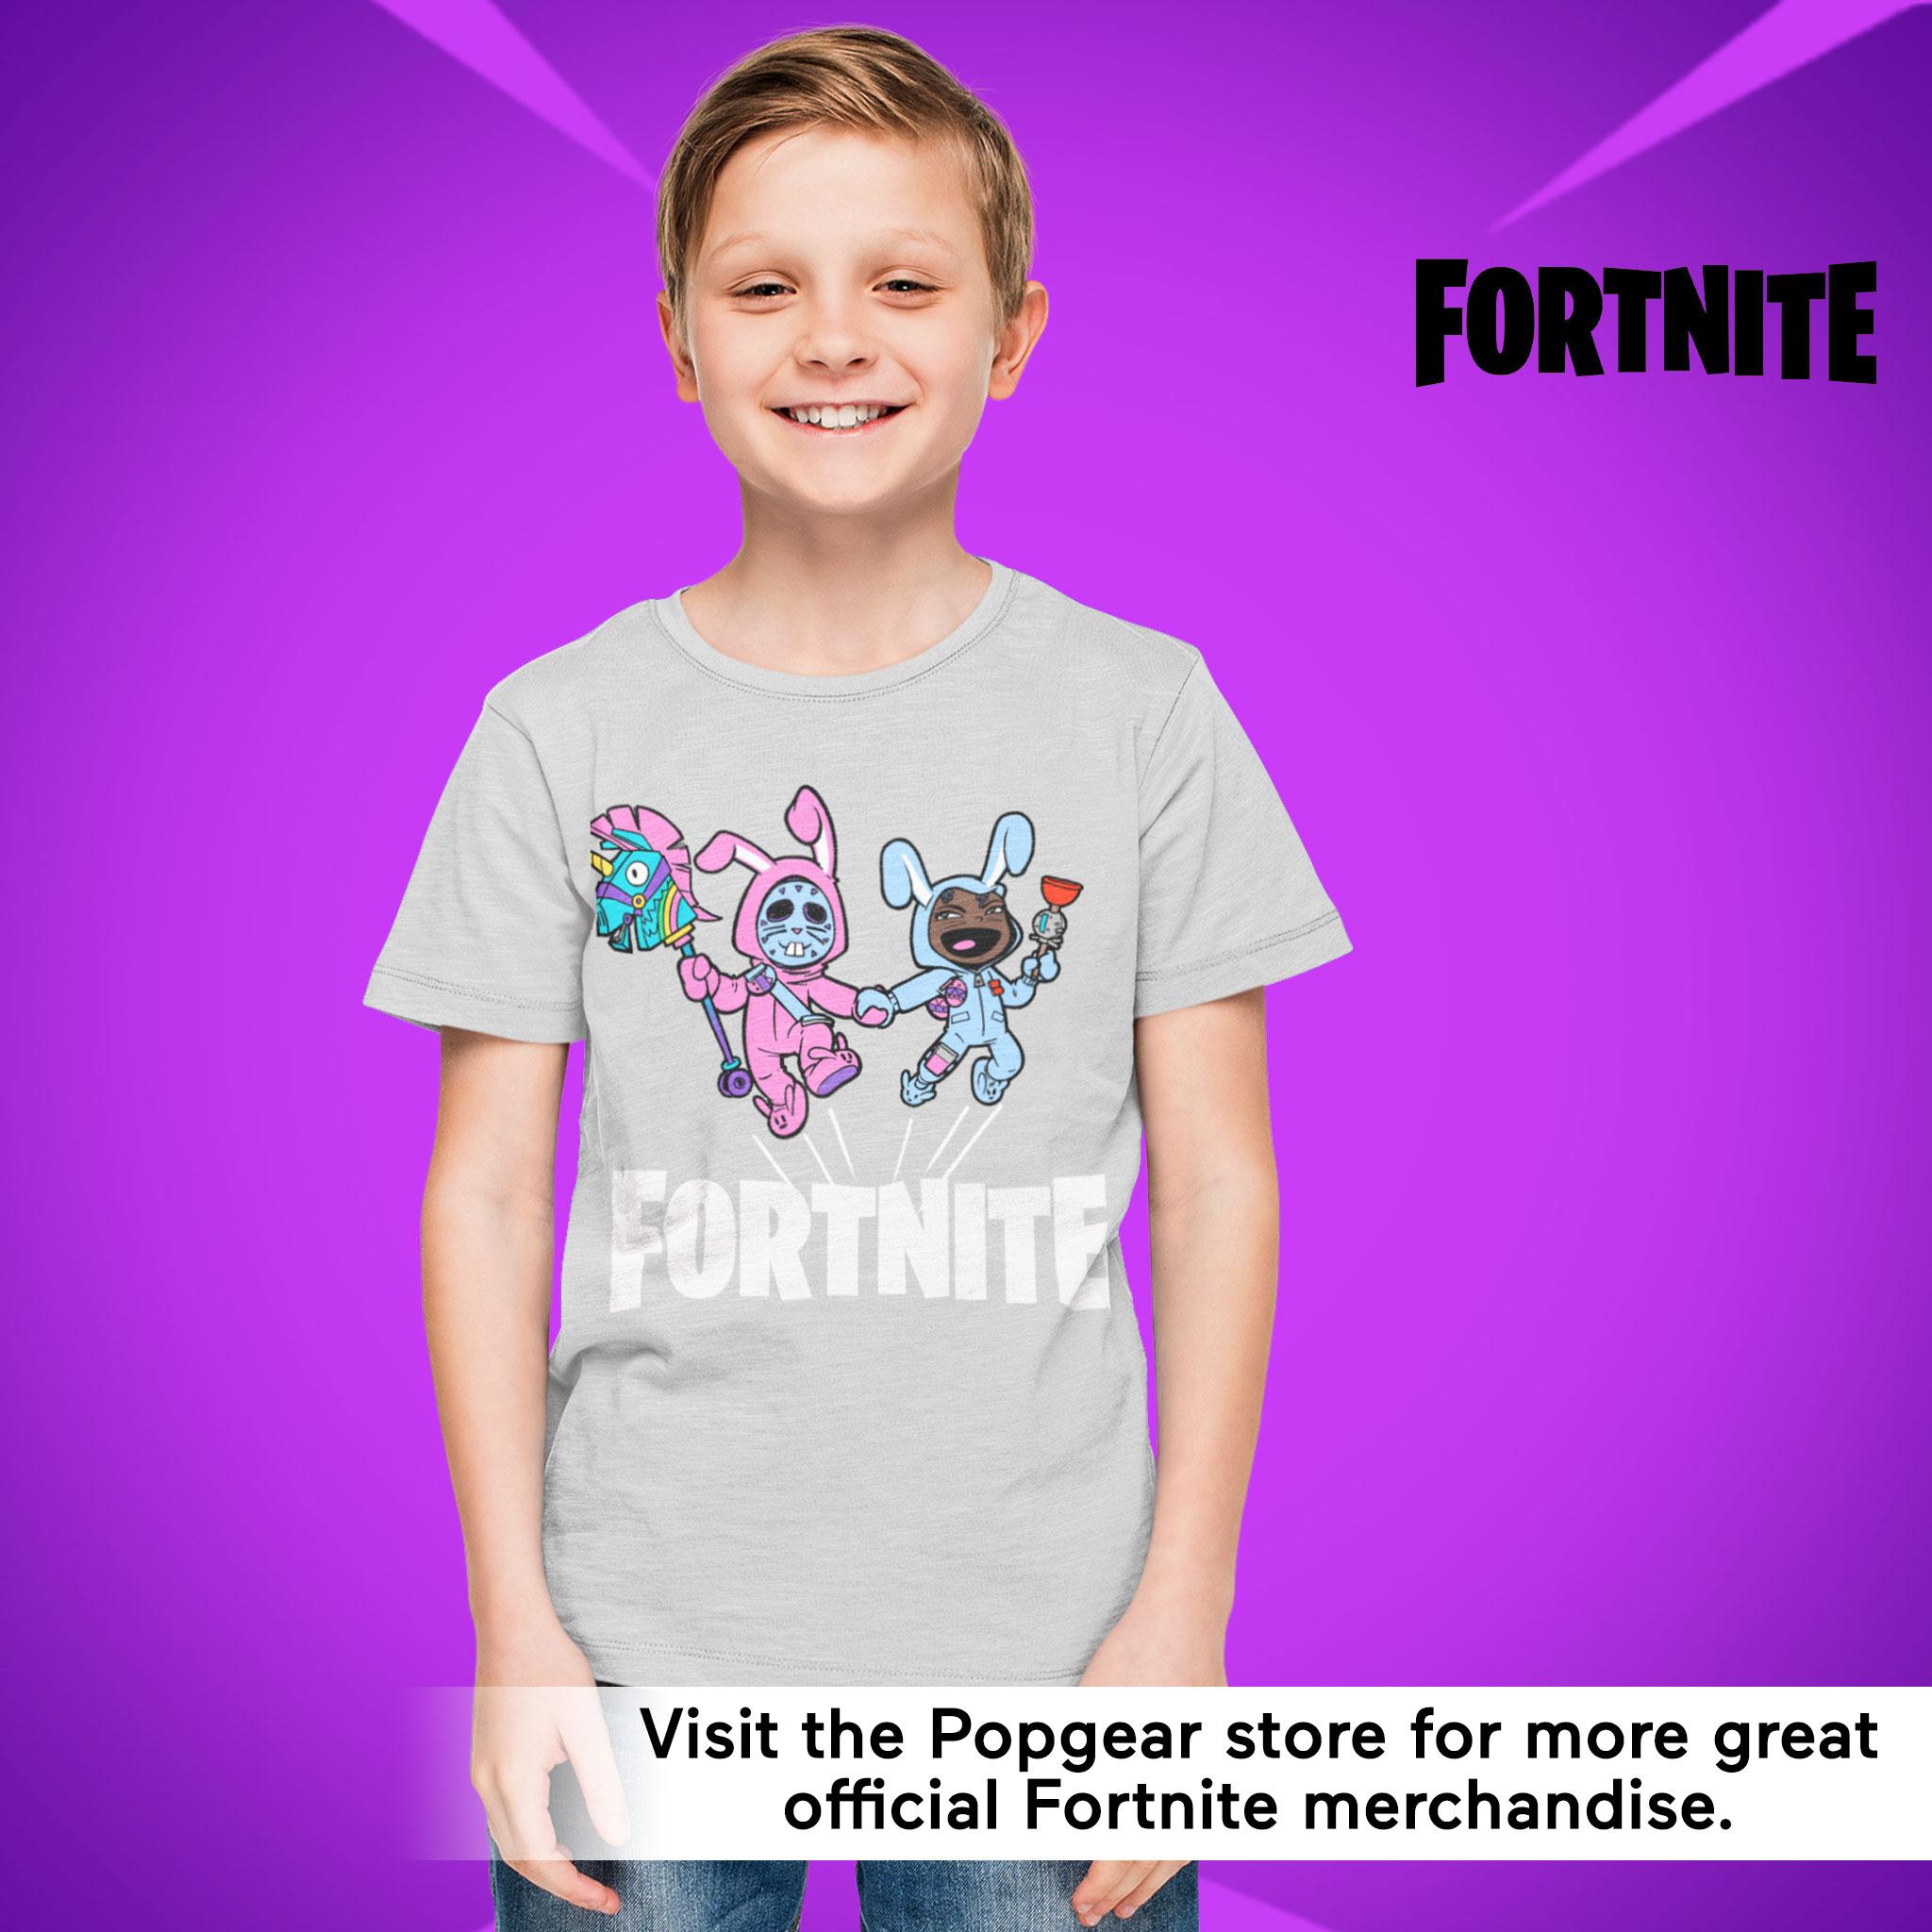 miniature 13 - Boys Fortnite T Shirt Bunny Trouble Official Merchandise